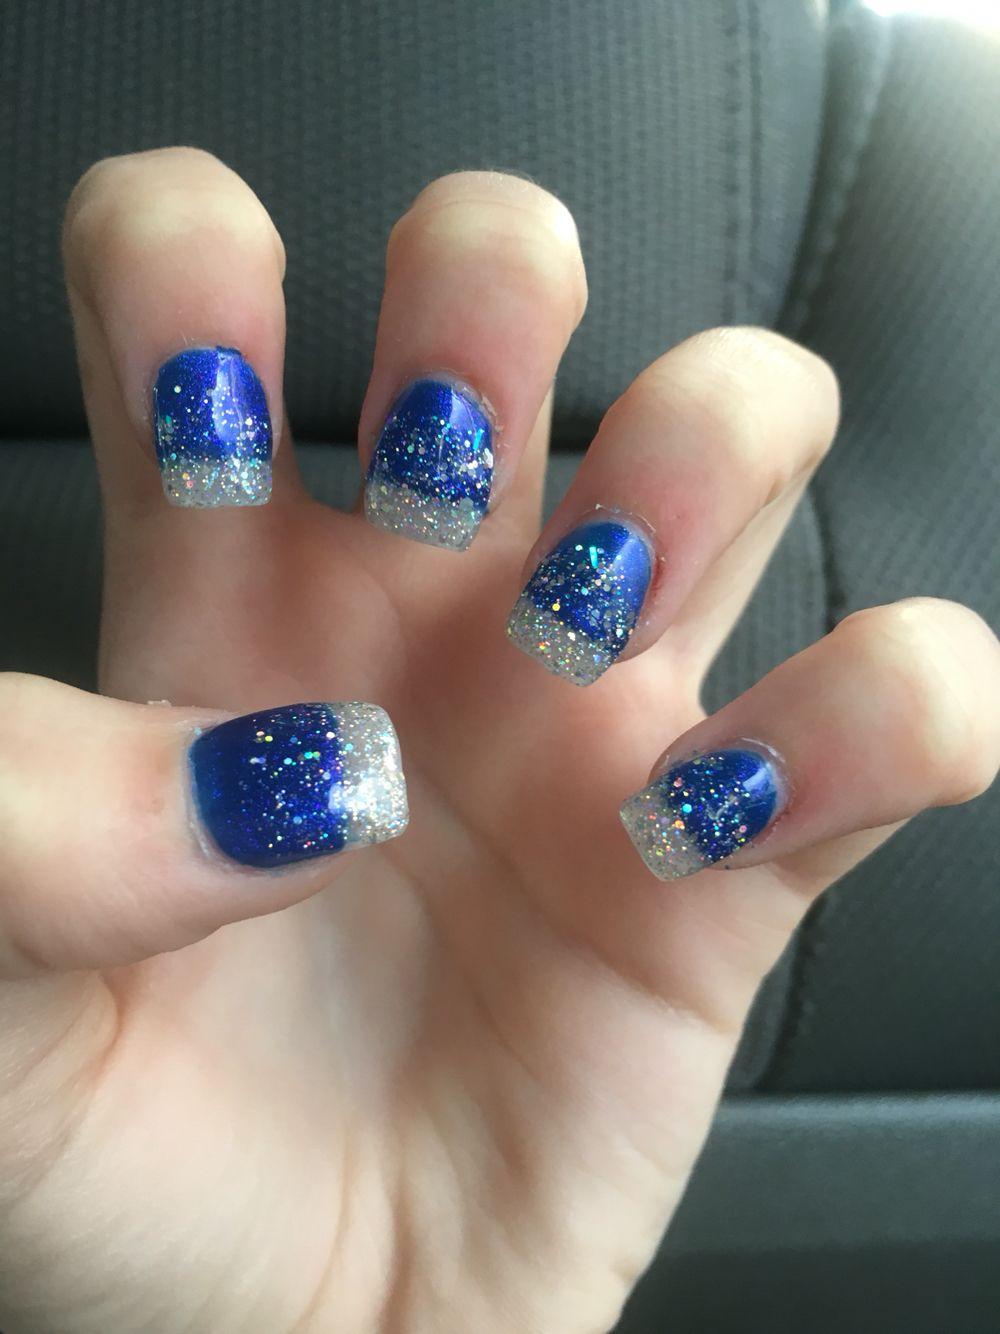 Royal blue fake nails with sliver sparkles. | Nails | Pinterest ...